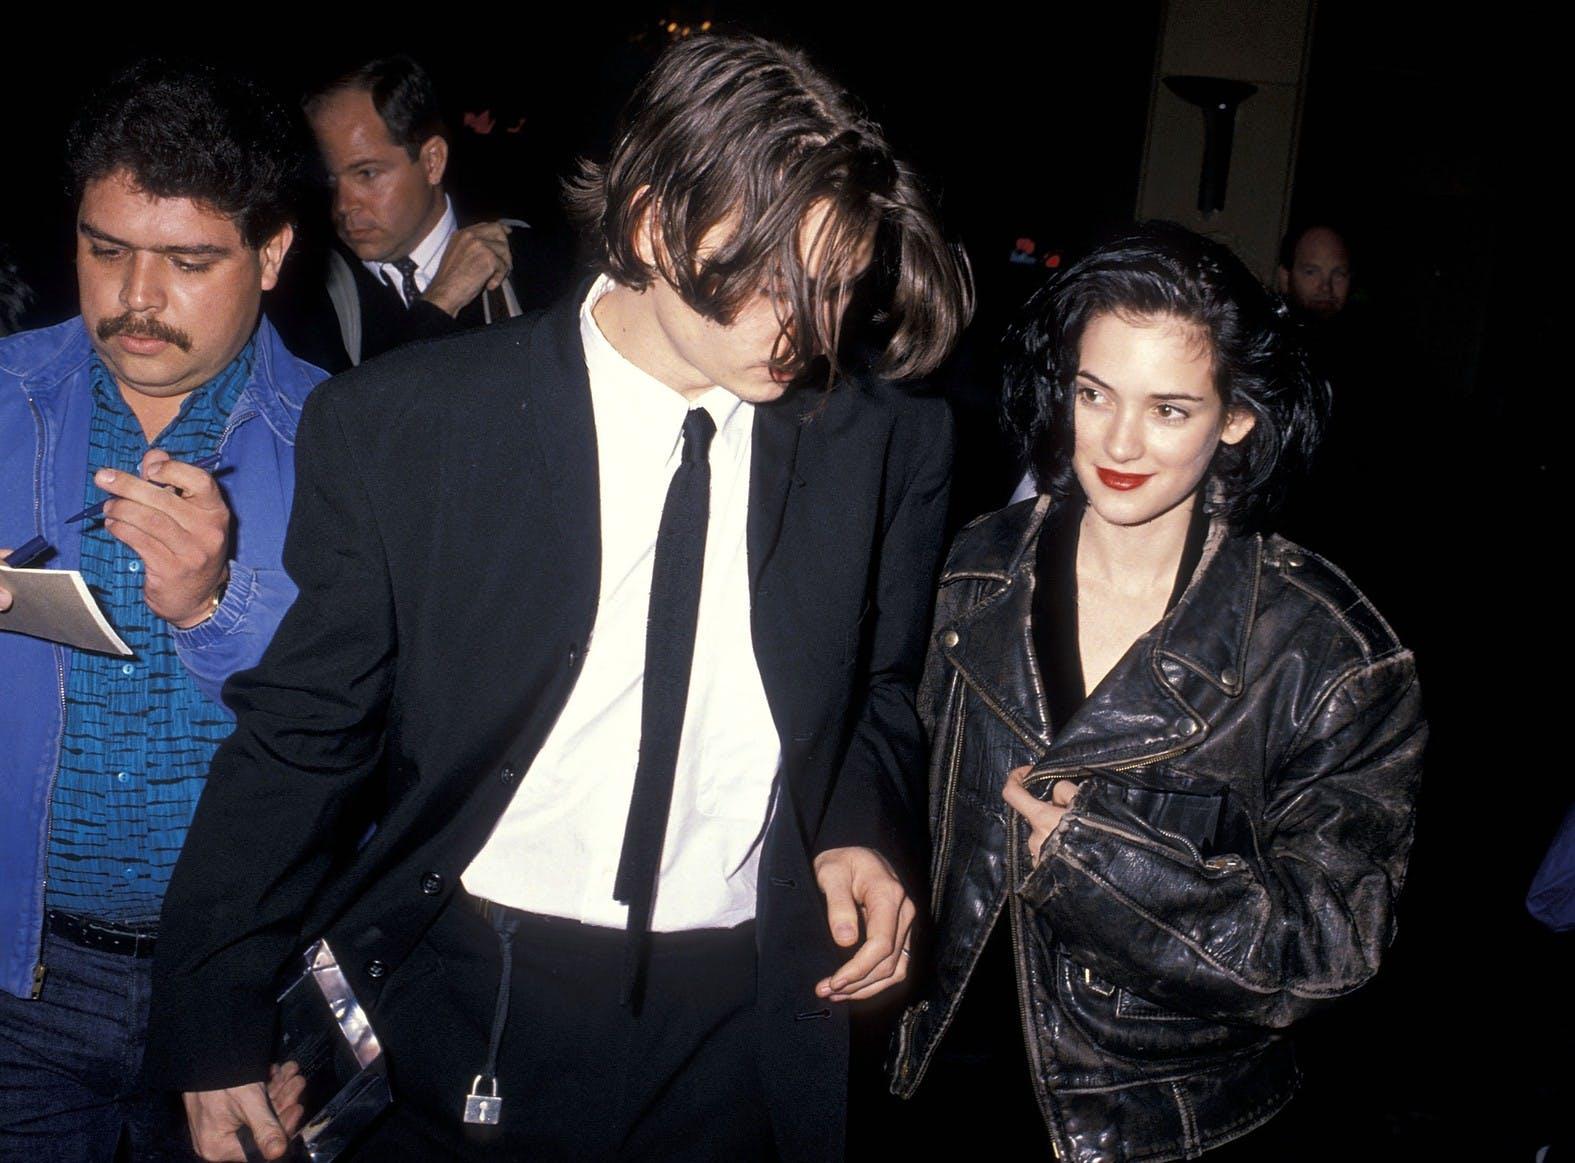 Winona Ryder with Johnny Depp.